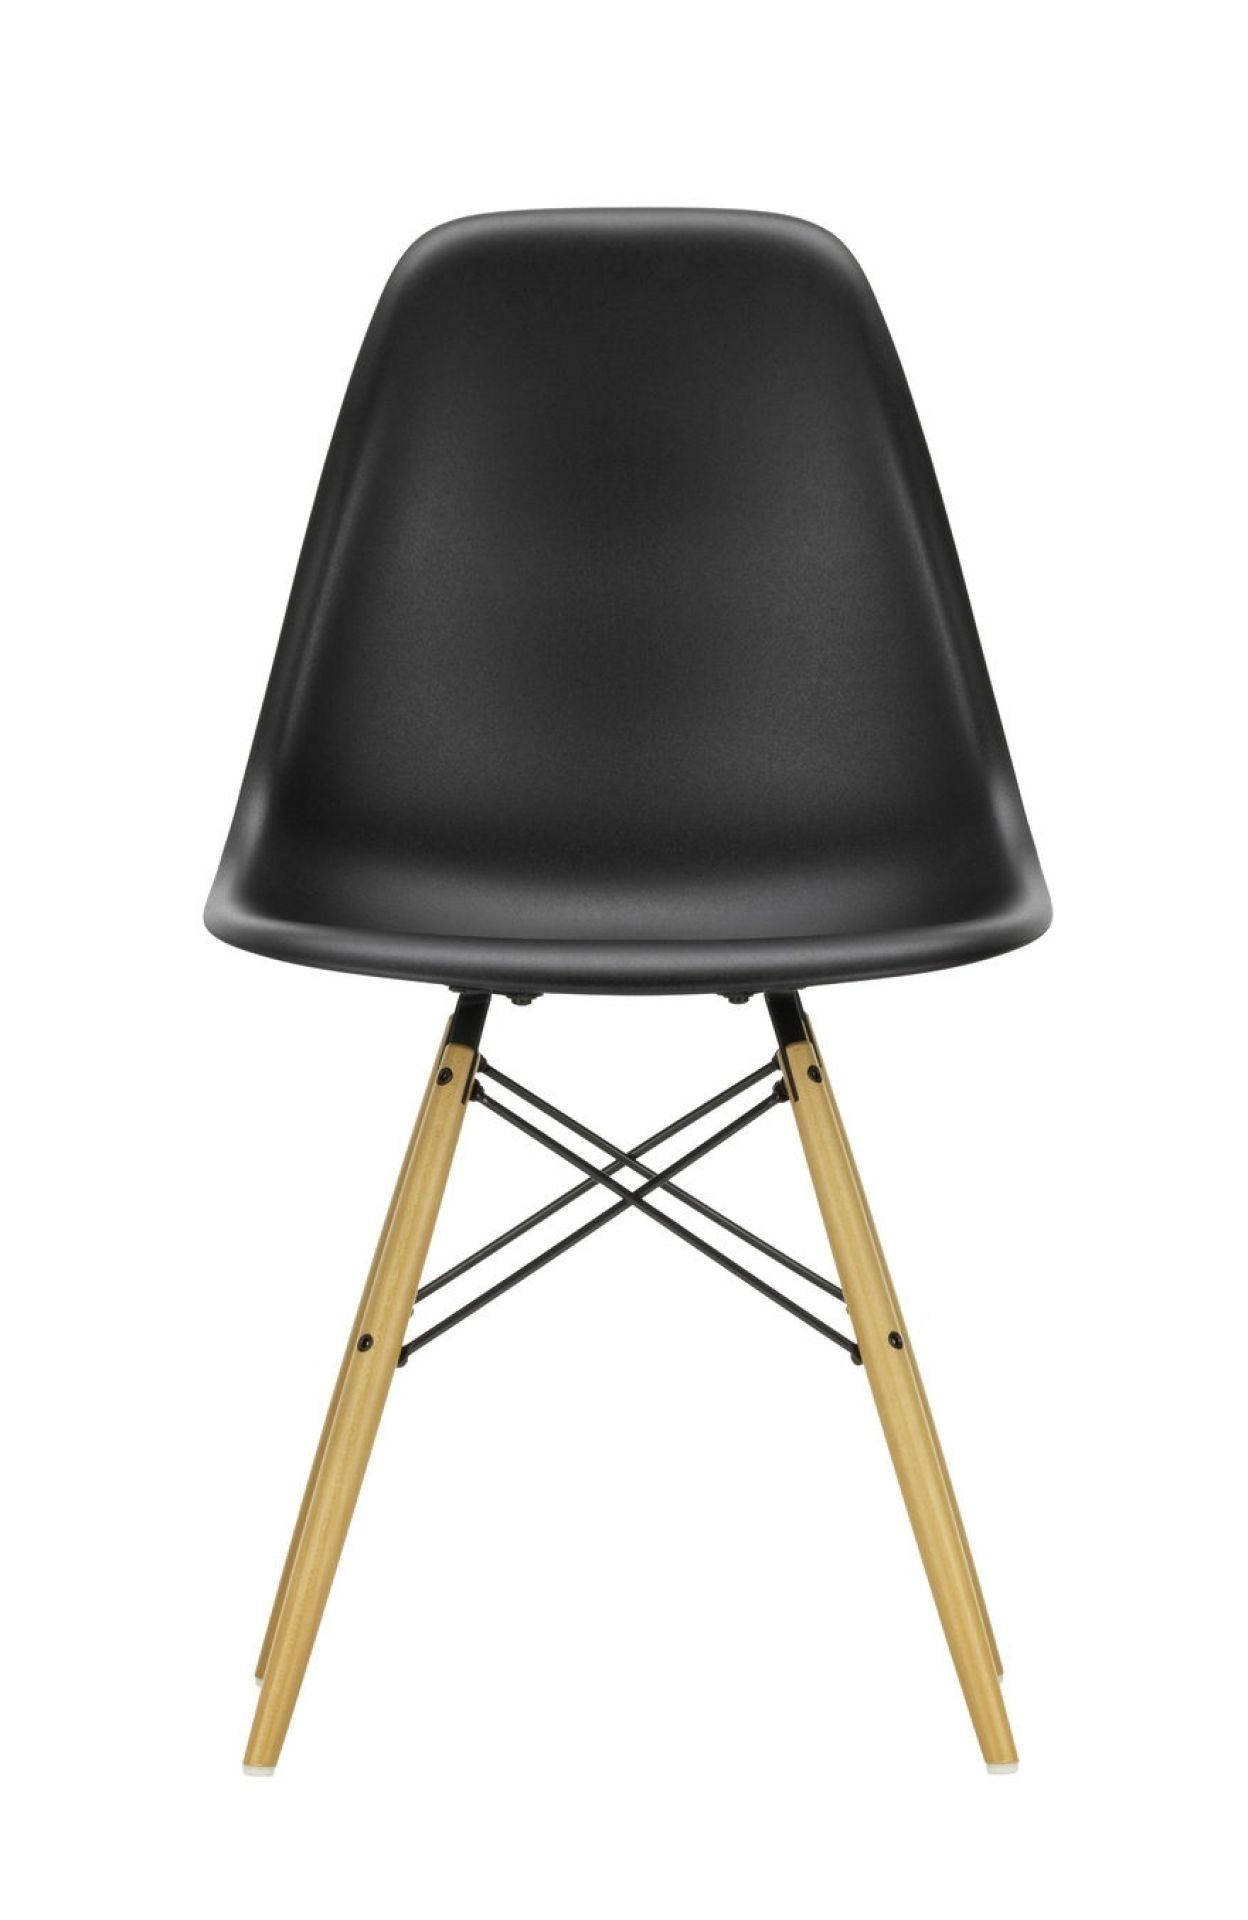 Eames Plastic Side Chair DSW Stuhl Vitra Esche honigfarben-Zartrosa